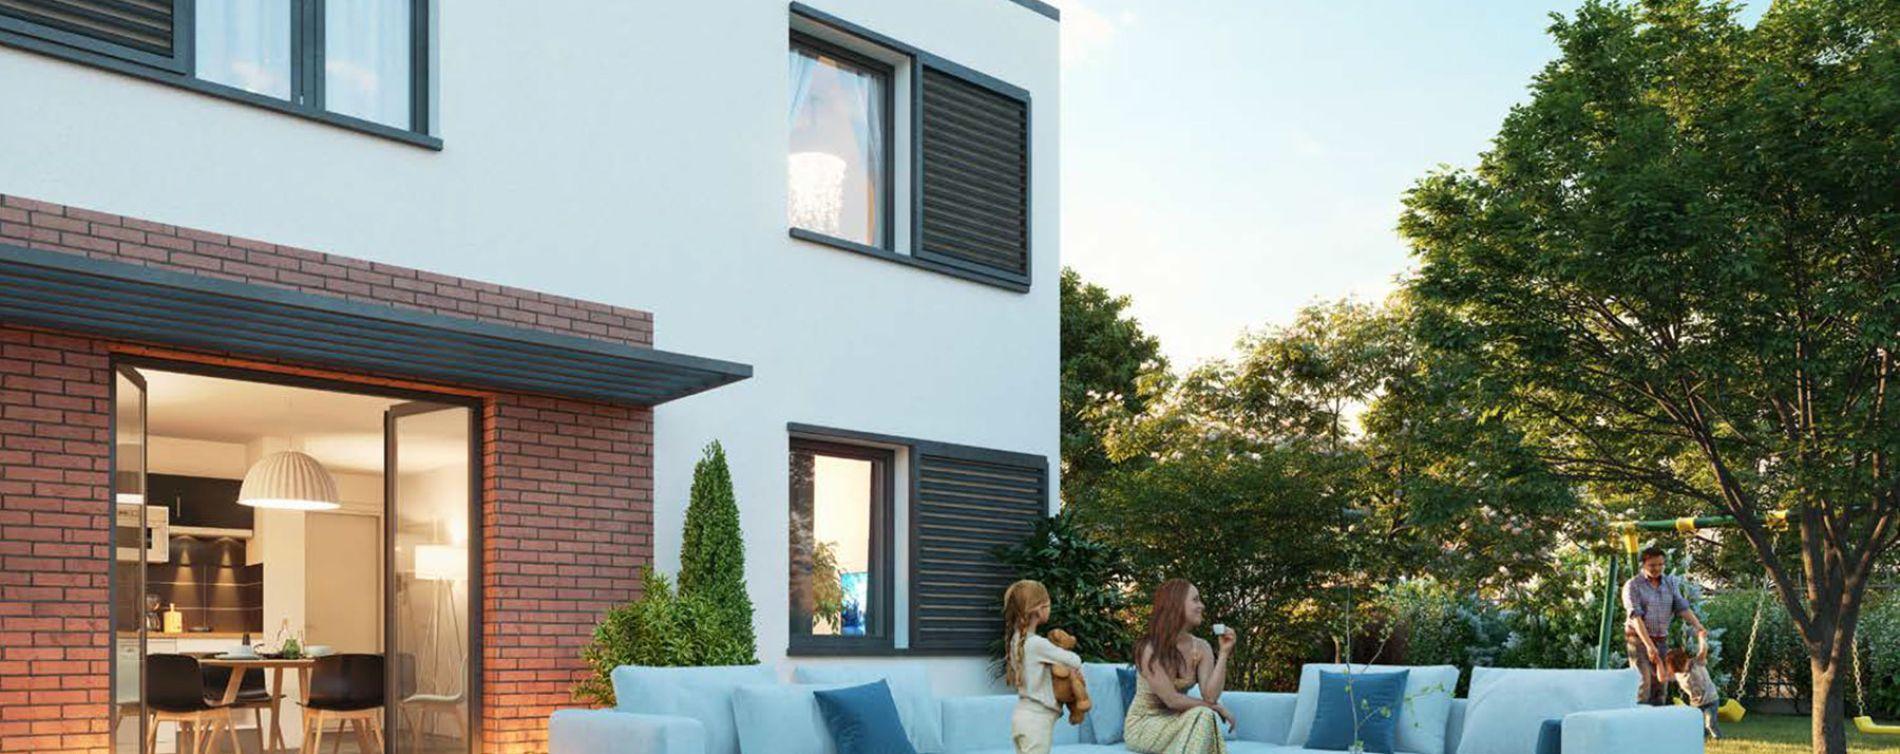 Tournefeuille : programme immobilier neuve « Lumina » (2)